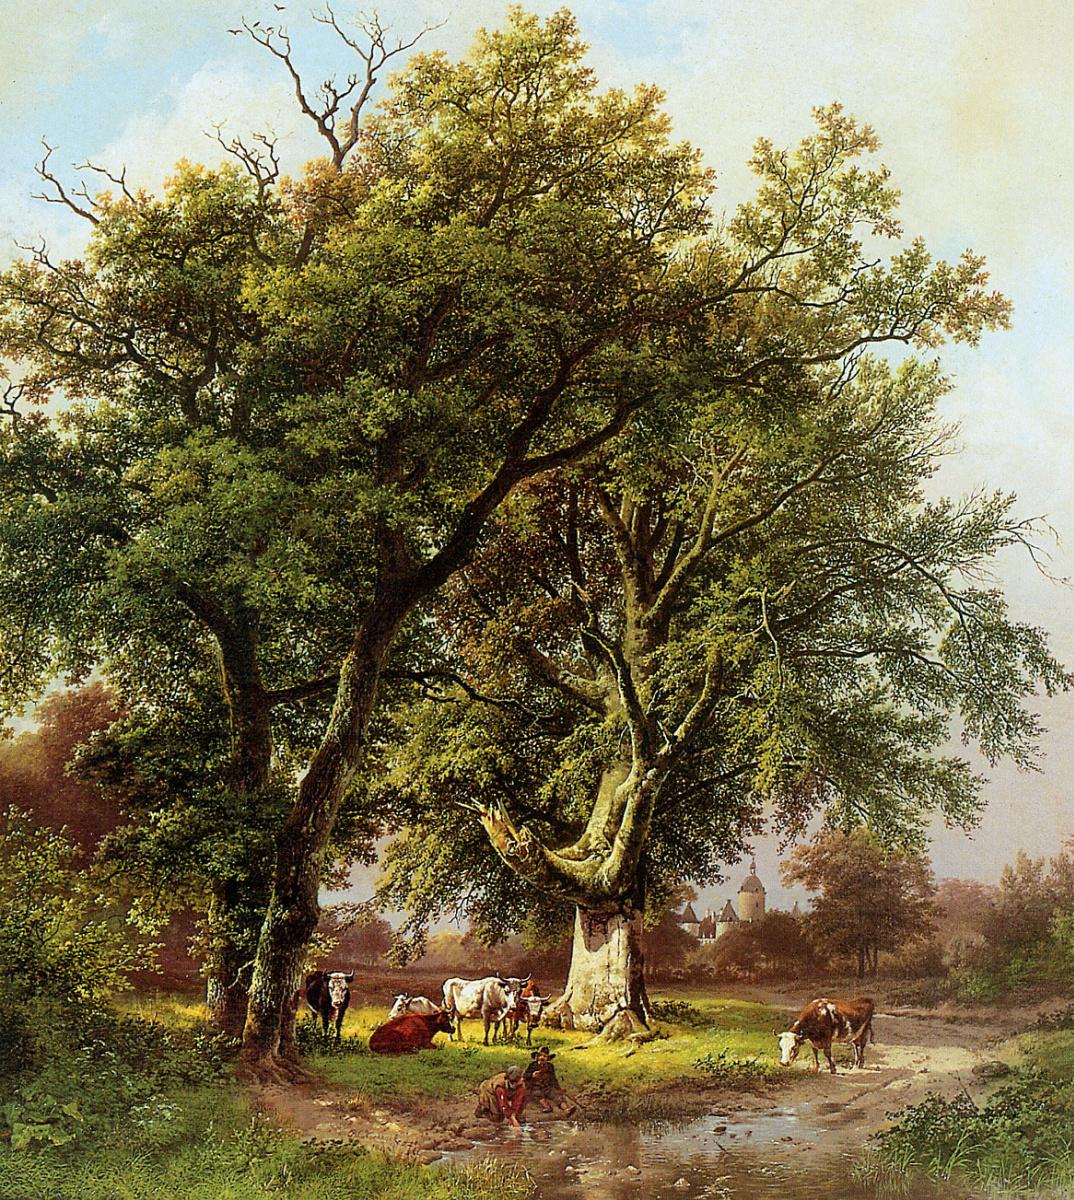 Barend Cornelis Kukkuk. Beech in front of the castle Moyland